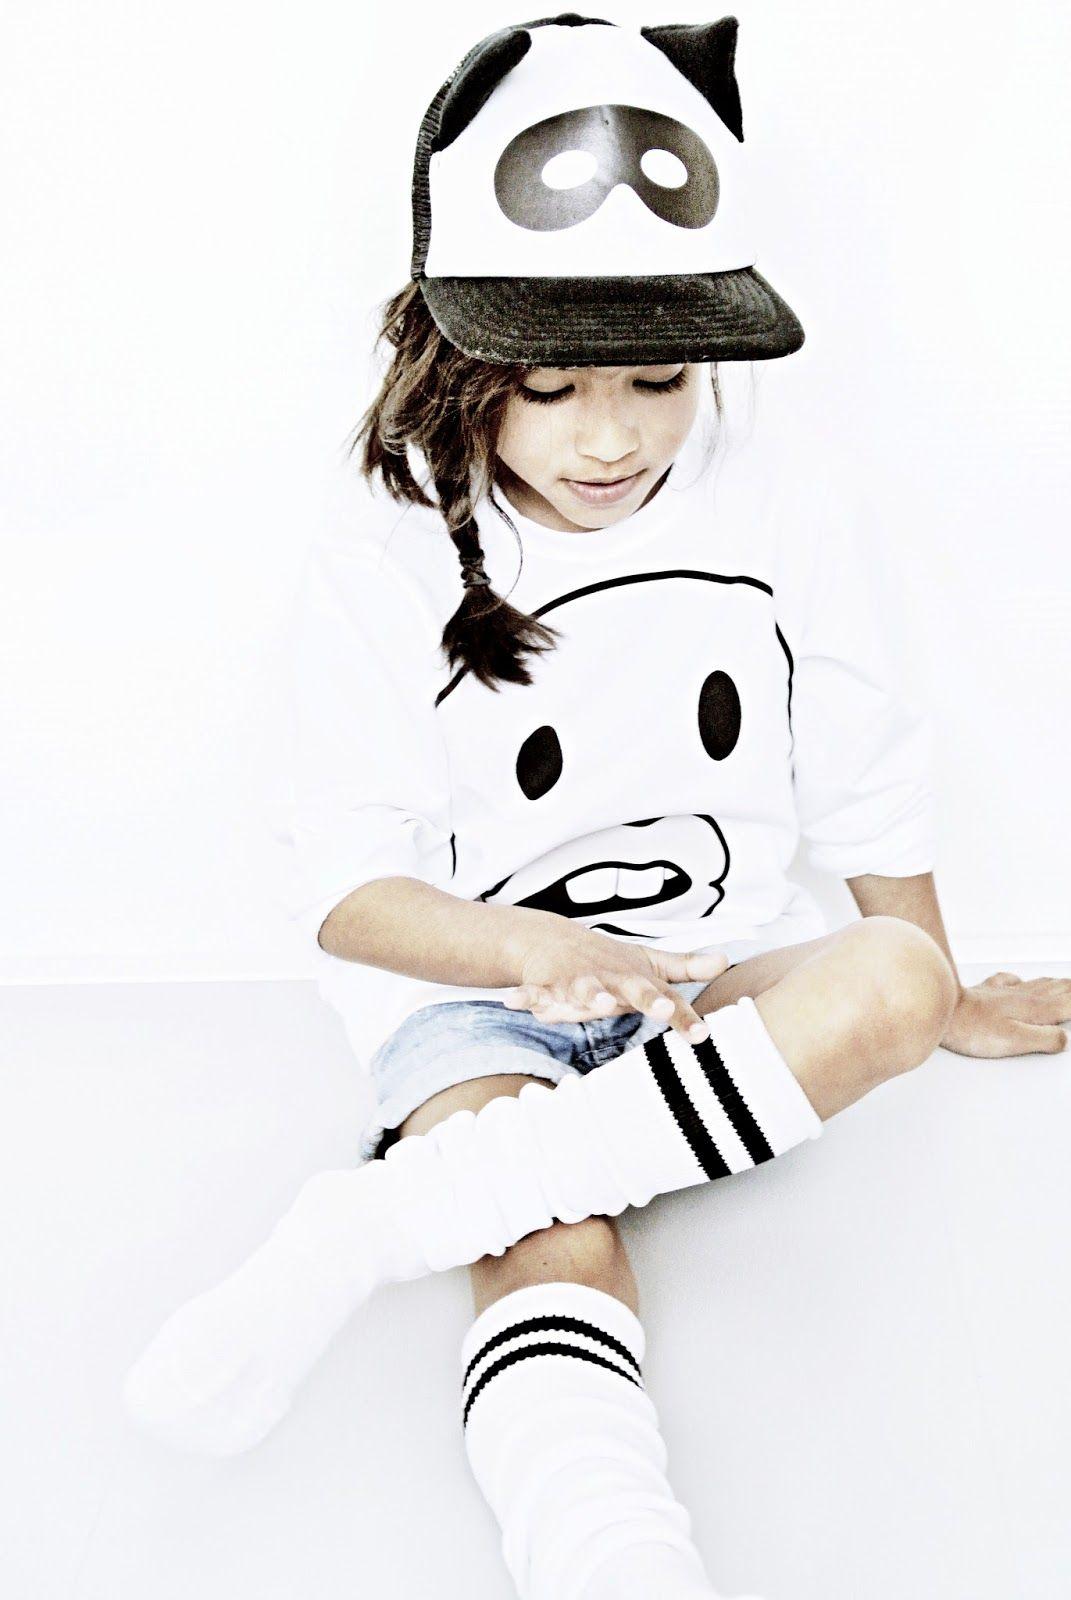 Wweater - C R L N B S M N S via Big & Belg Denim shorts - H & M Cap - Beau LOves via Kids Department